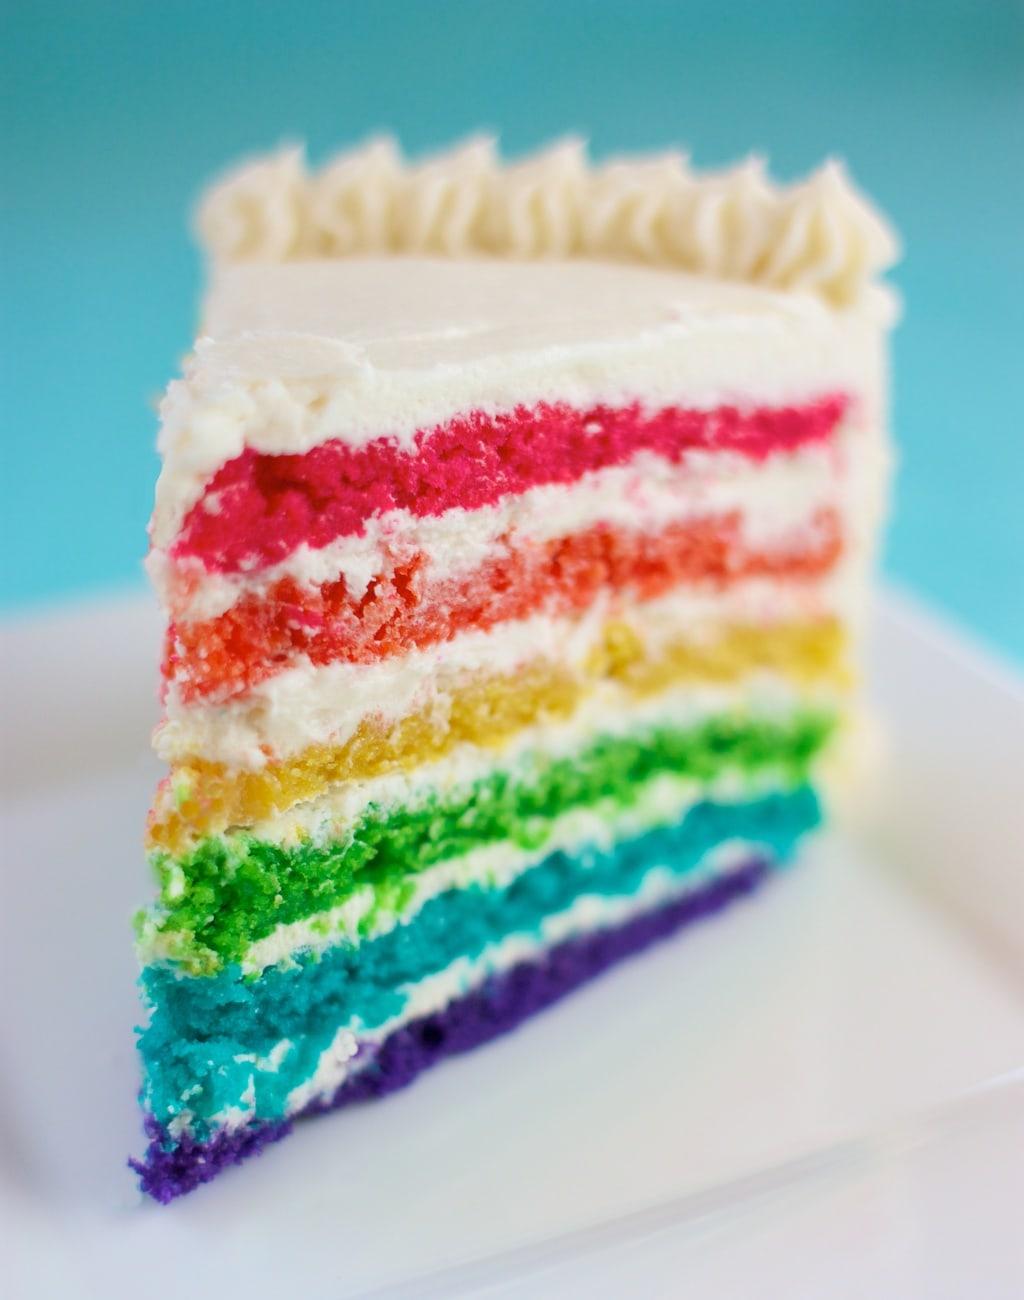 Rainbow Layer Cake Slice on a Plate